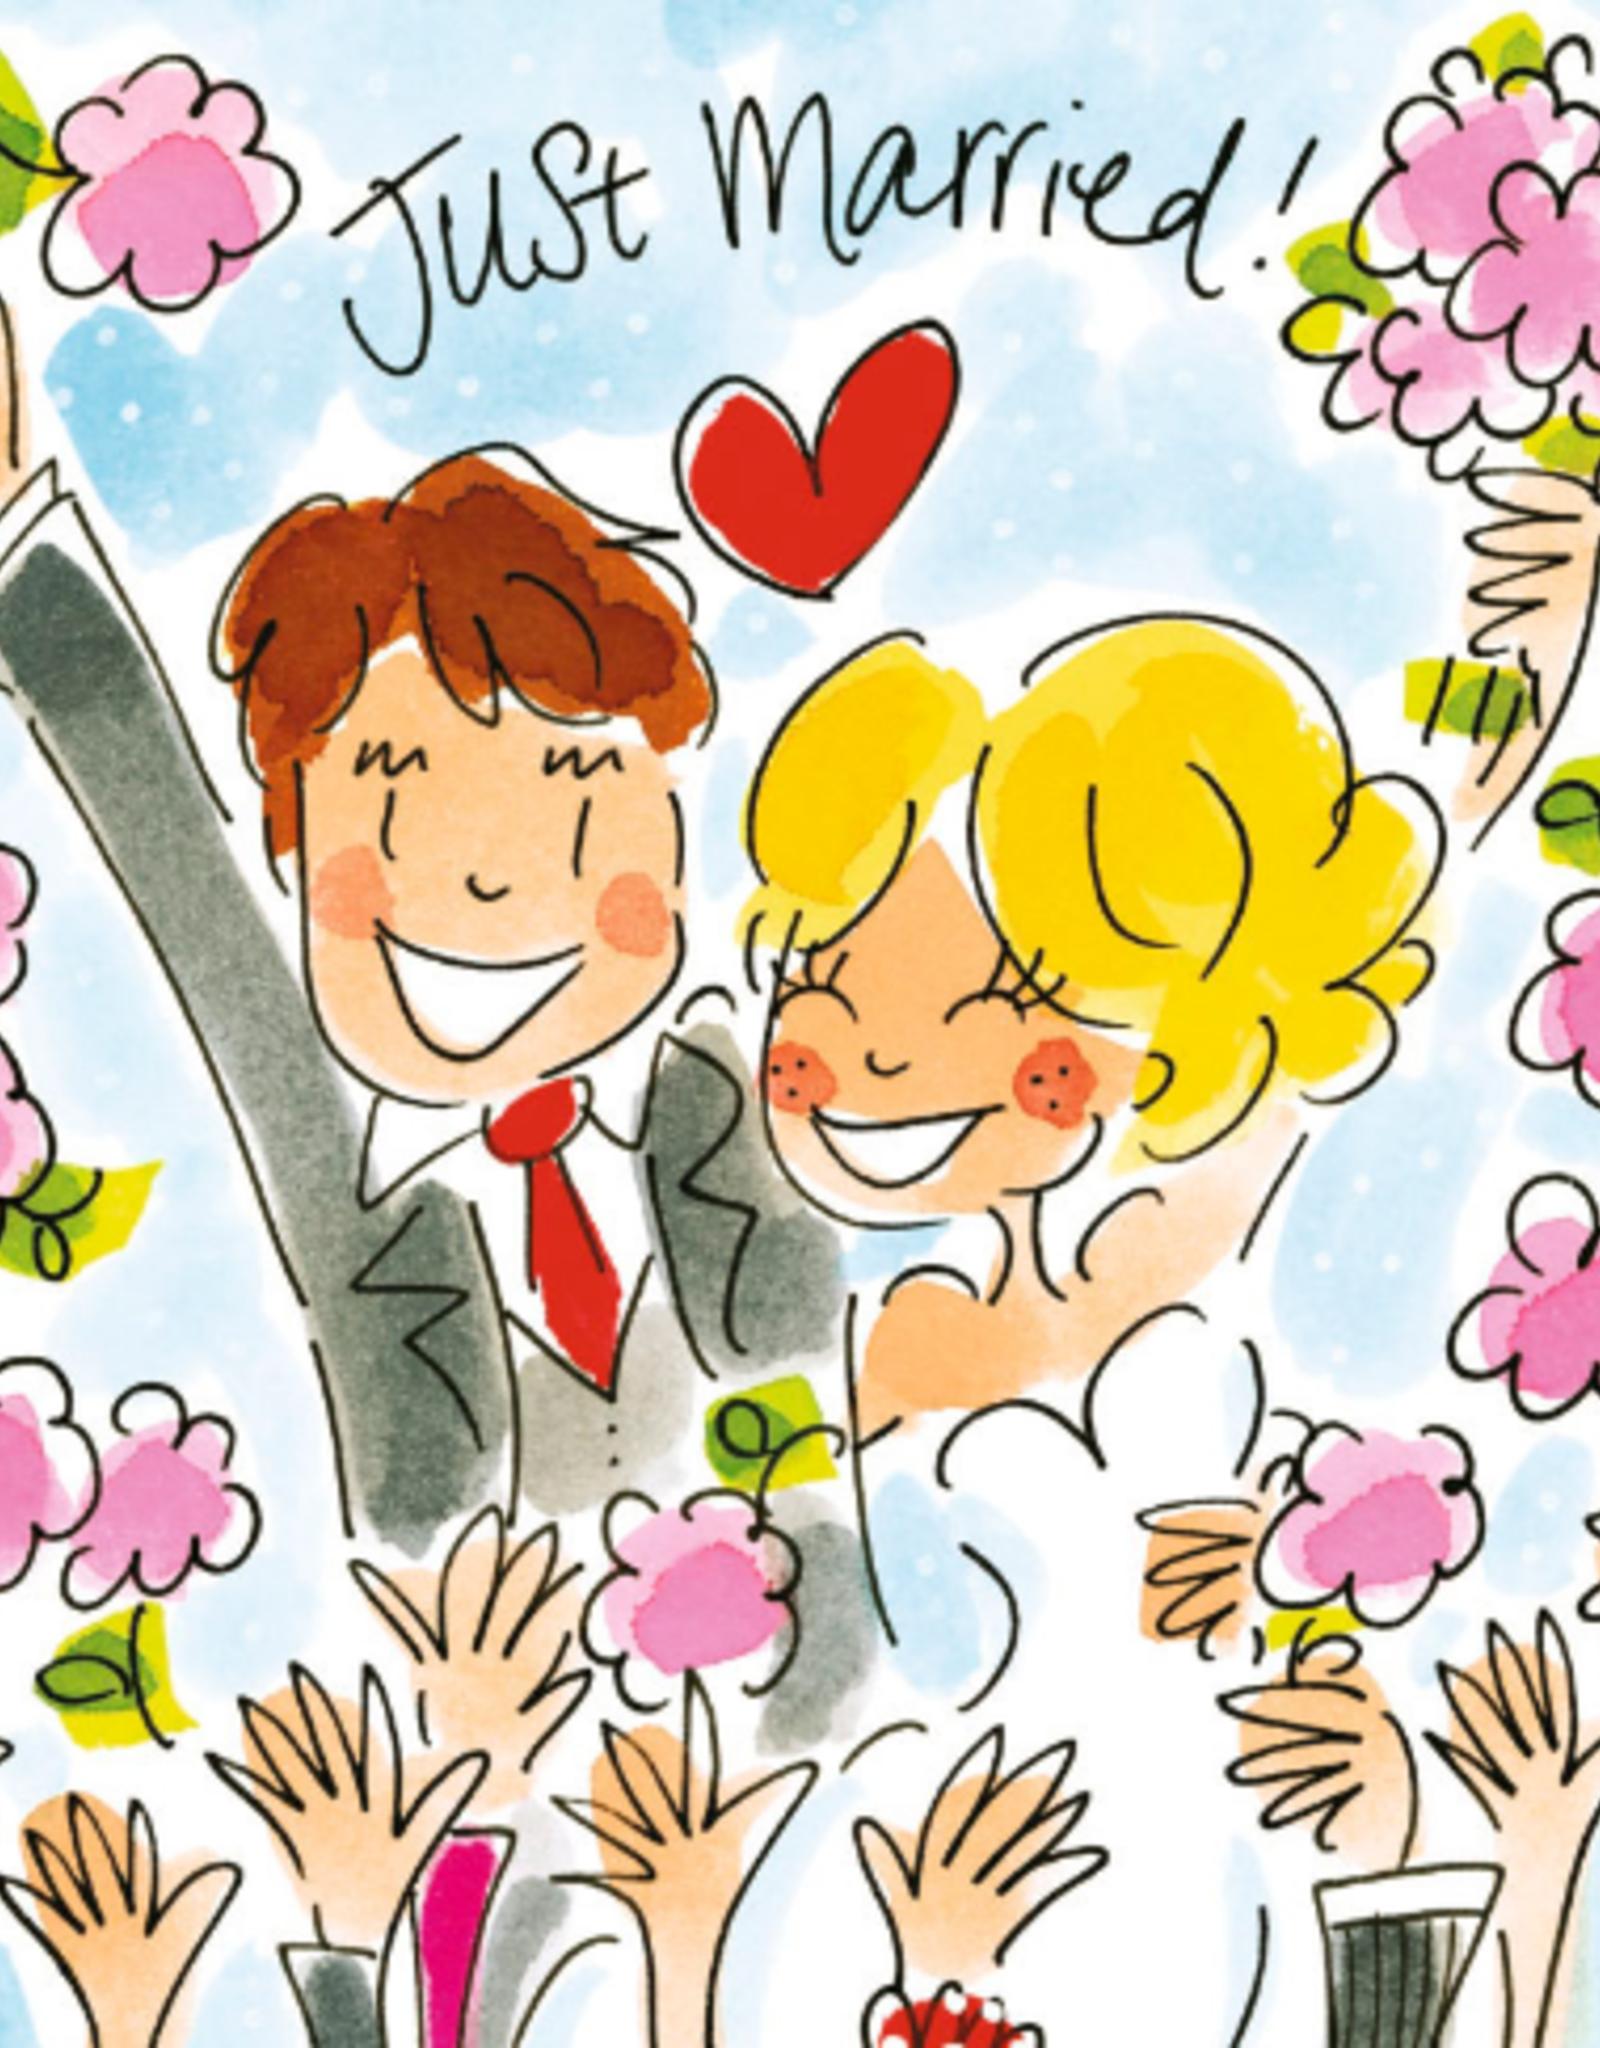 Blond Amsterdam Just Married! - Wenskaart Blond Amsterdam